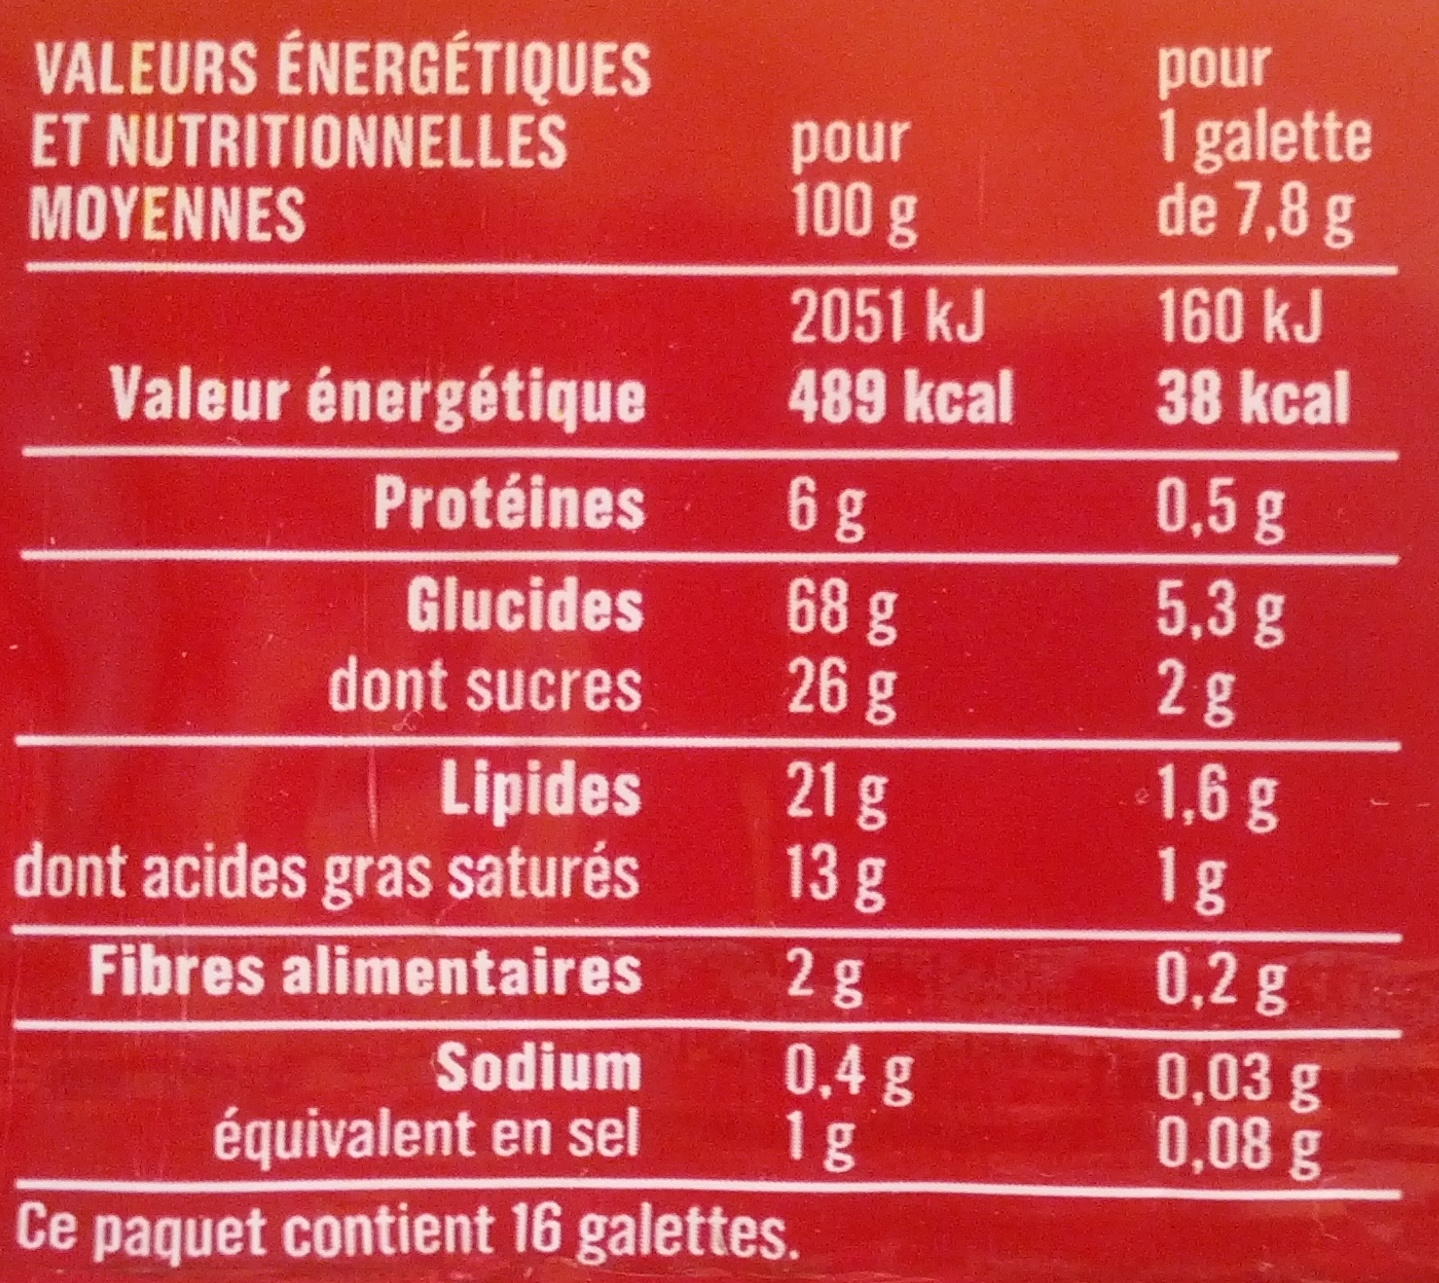 Galettes bretonnes pur beurre - 营养成分 - fr